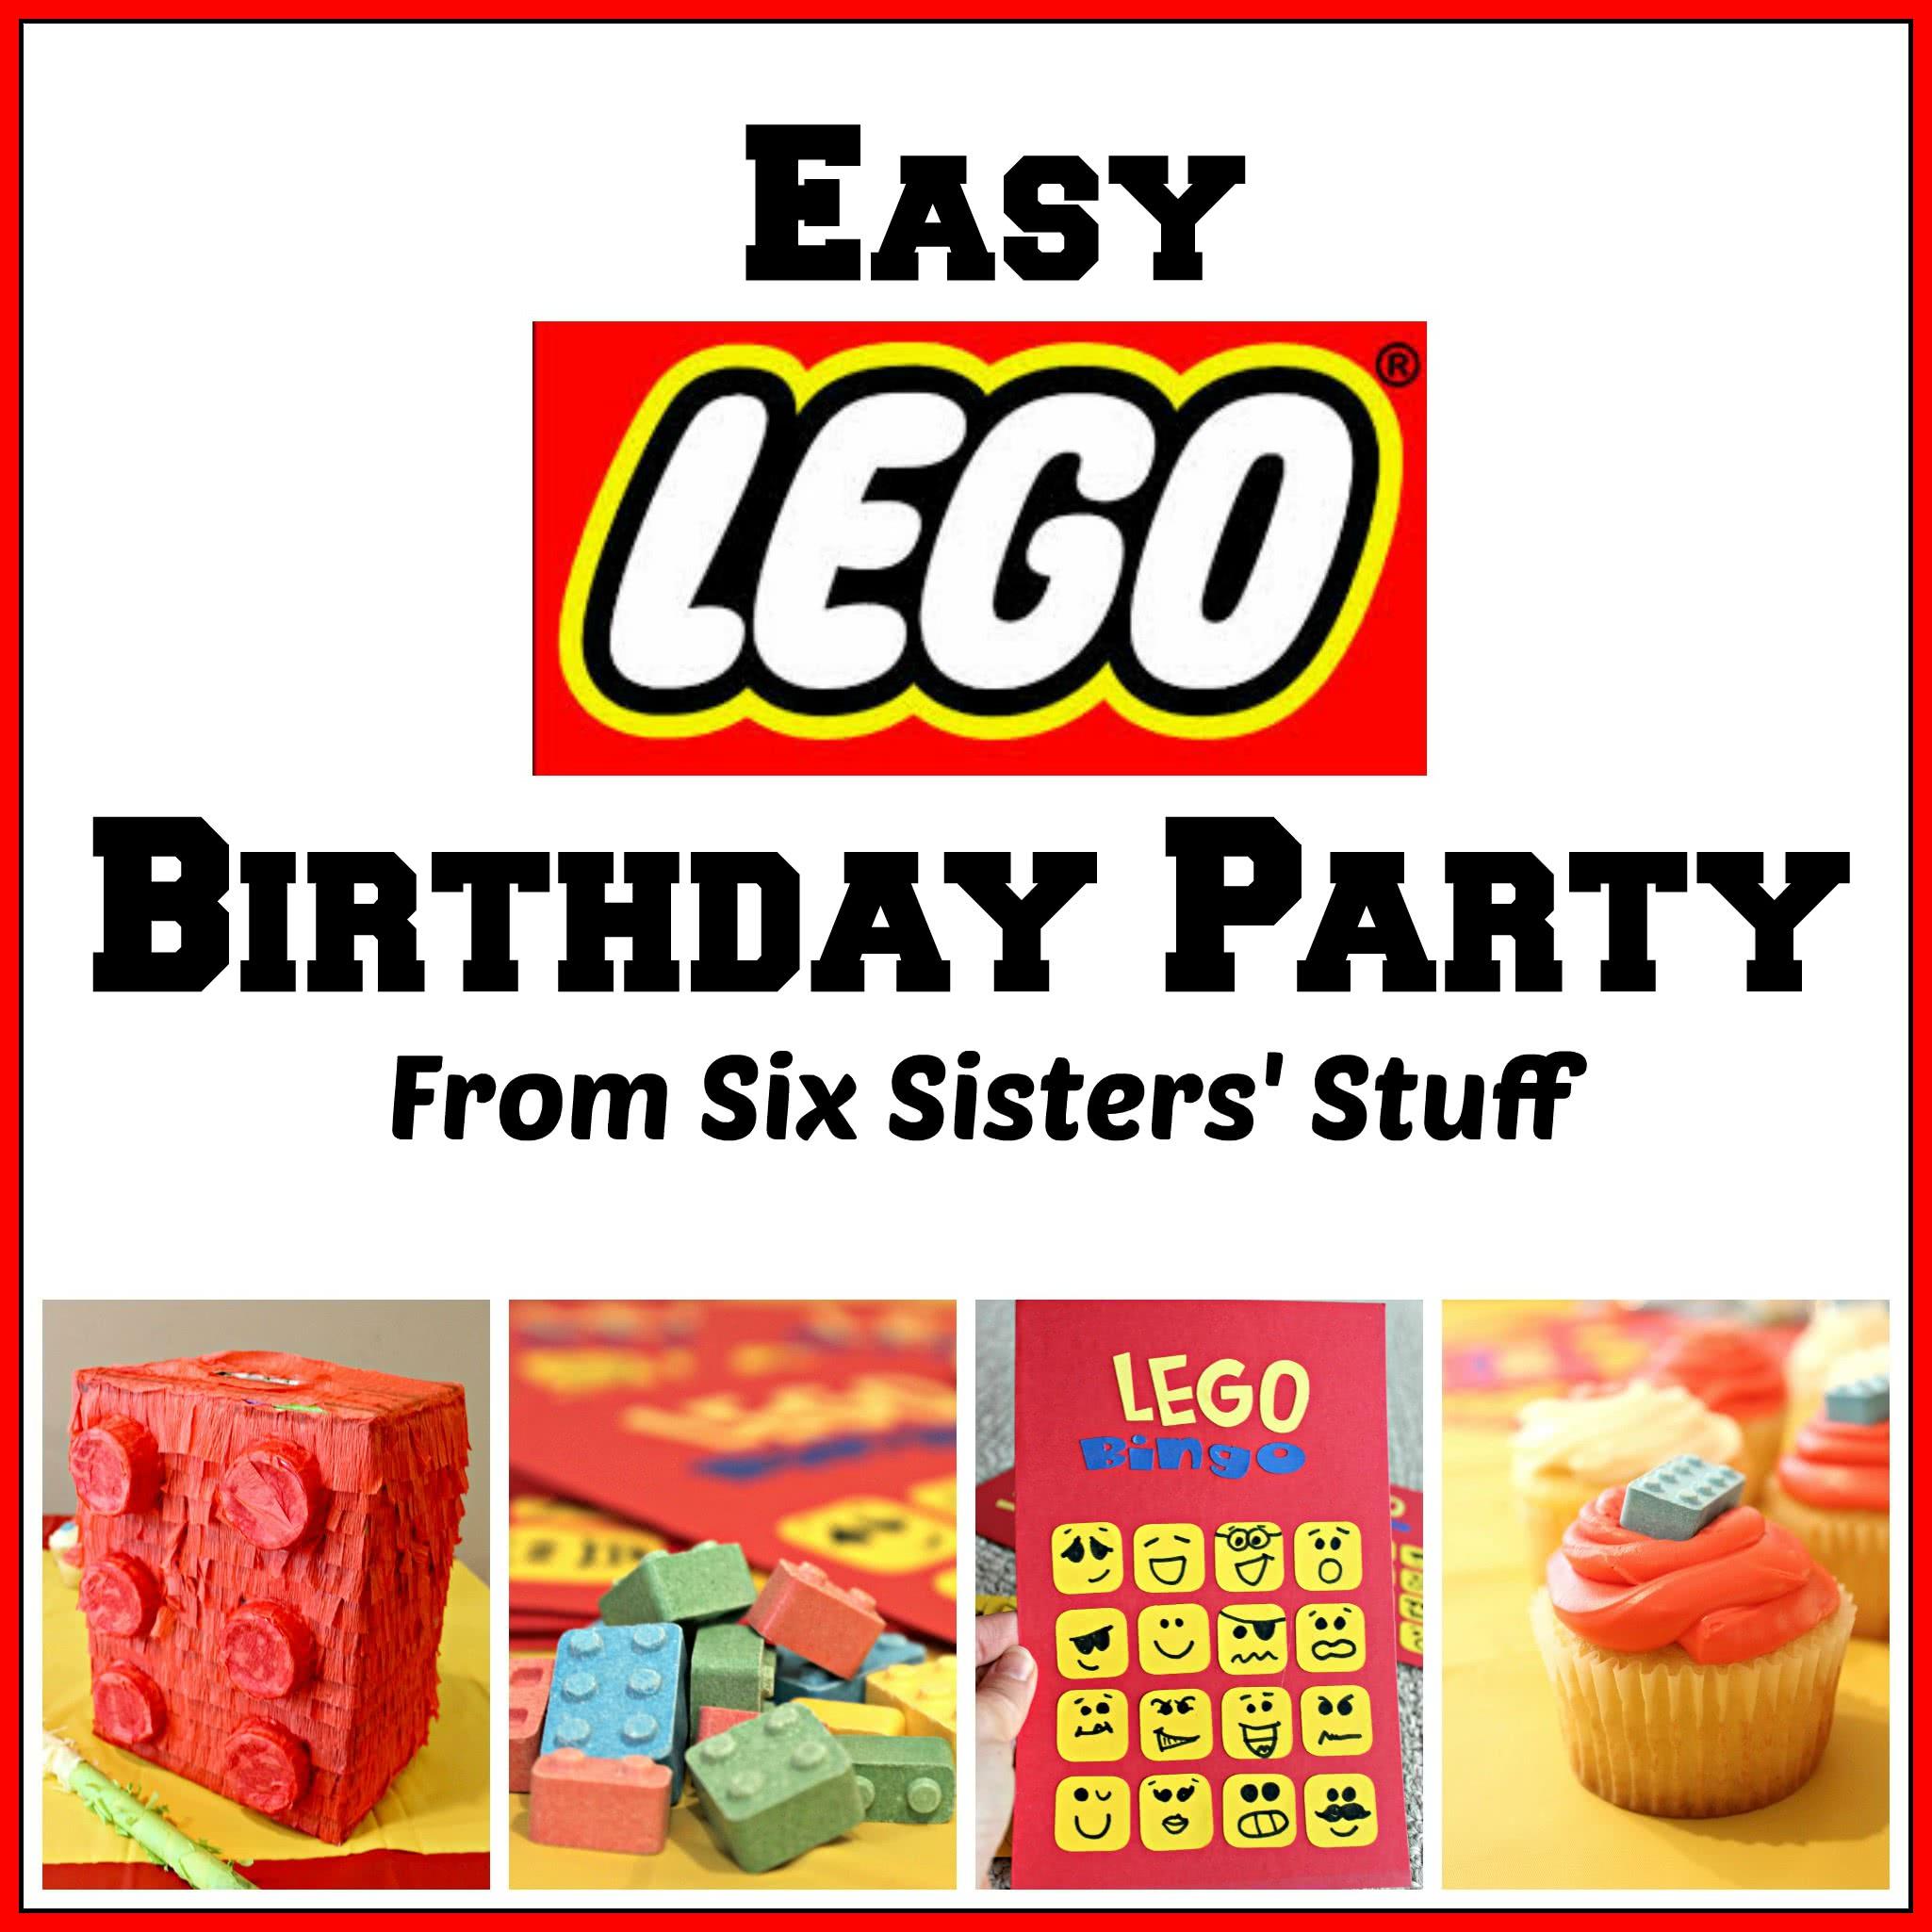 Easy Lego Birthday Party